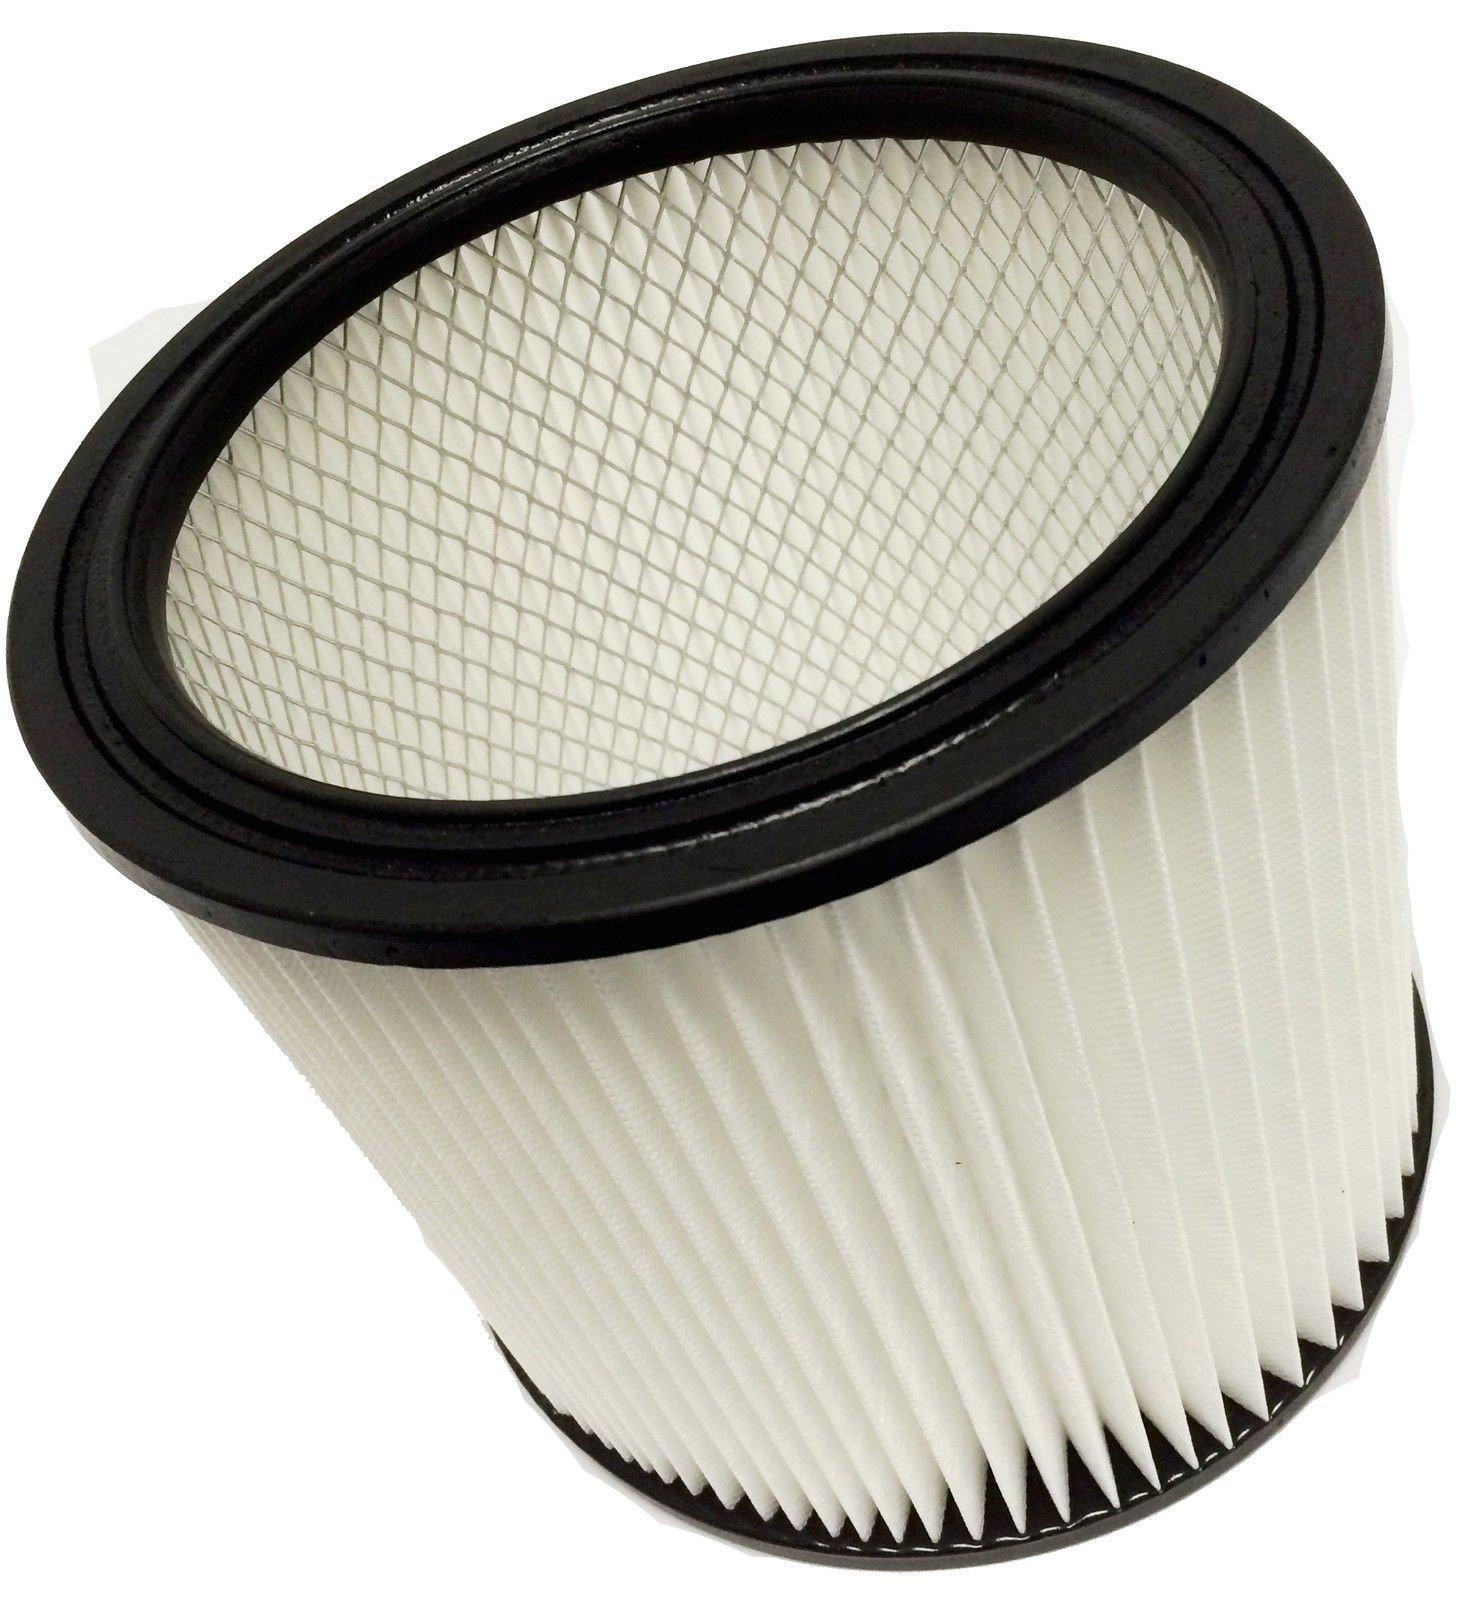 Replacement Filter Cartridge for Shop Vac Shop-Vac 9030400, 90304, 903-04-00, 903